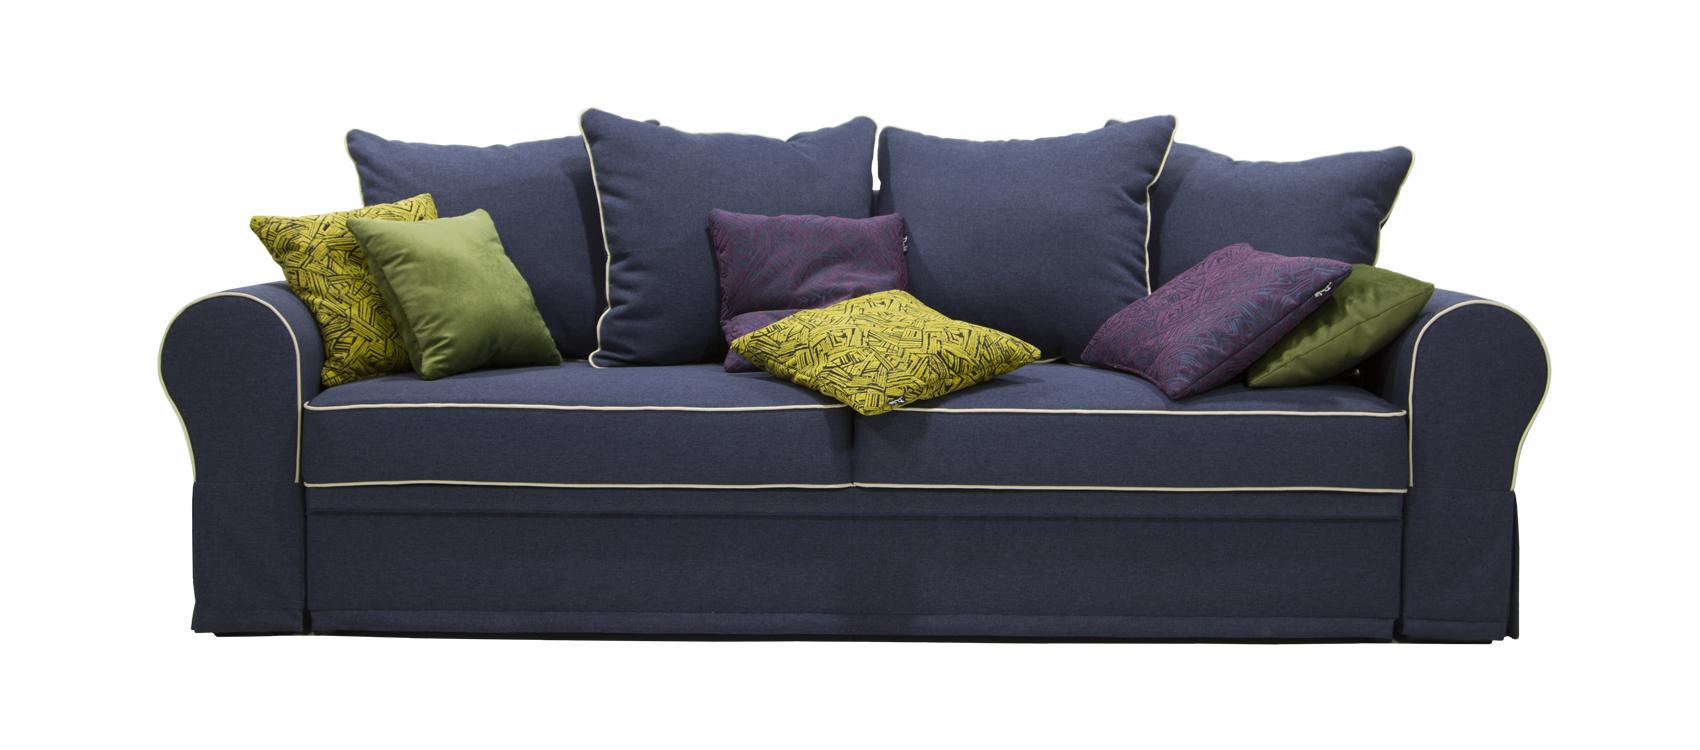 Sofa ALICE фото 9